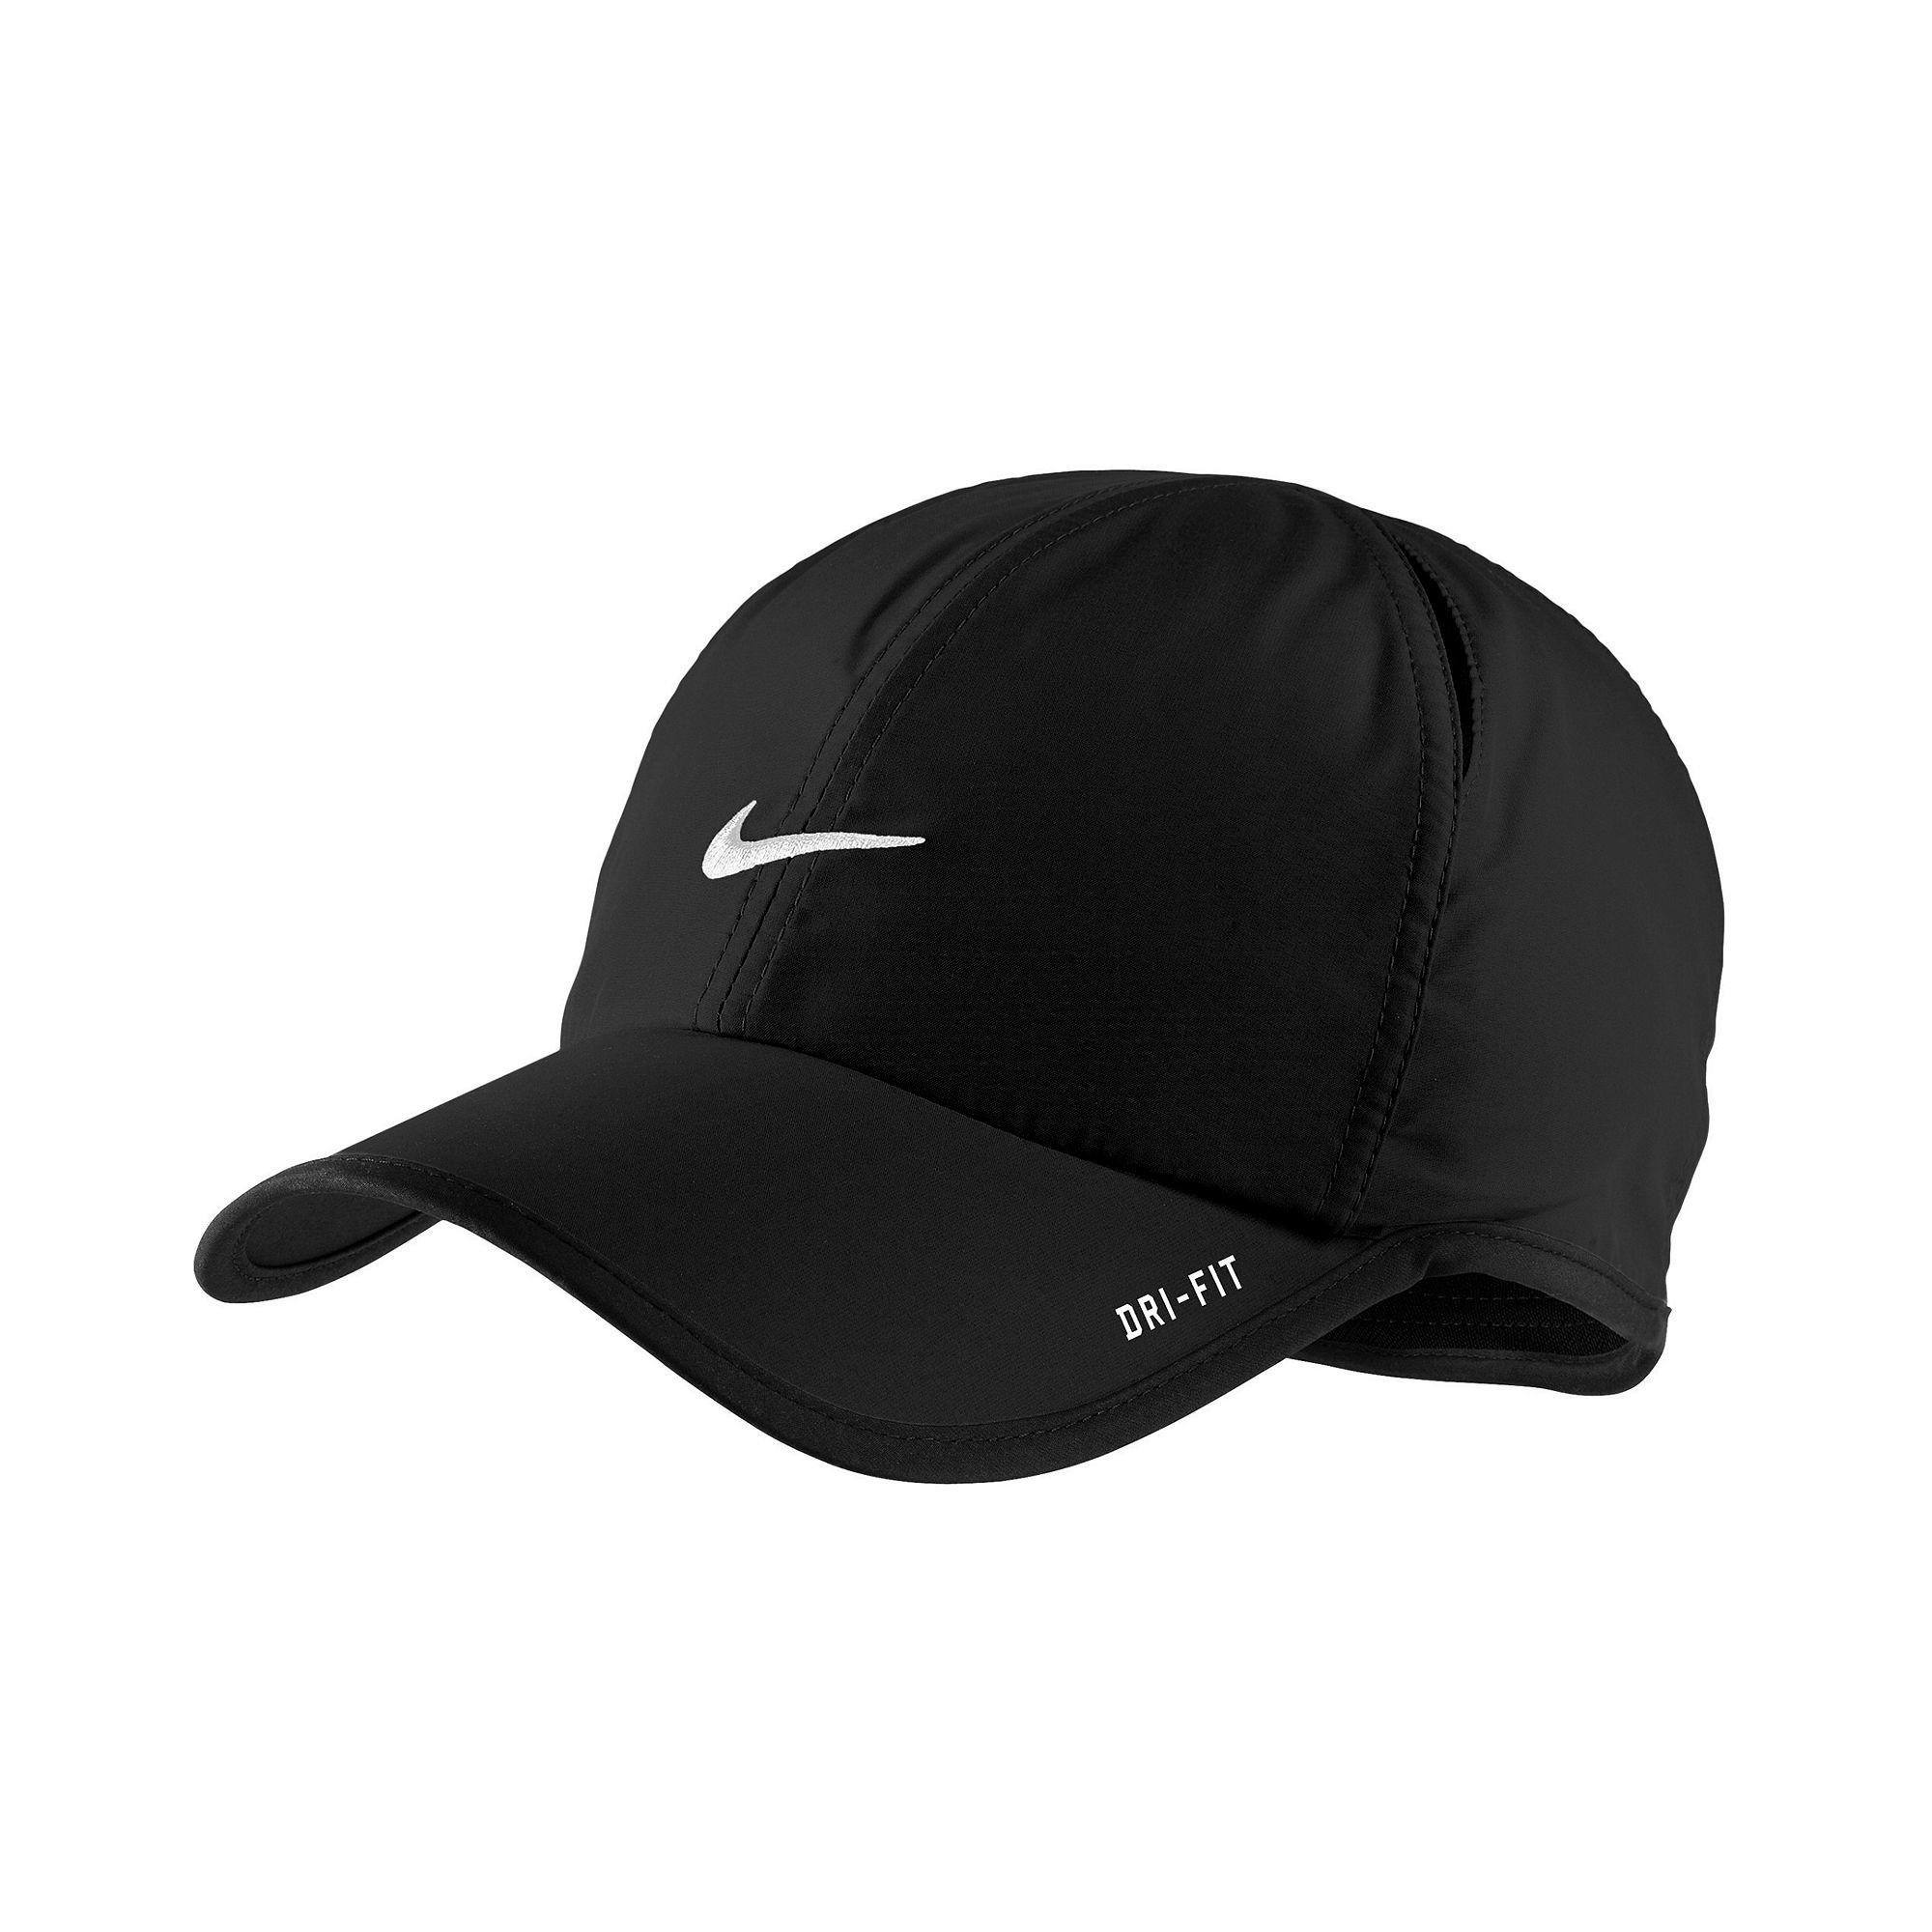 c1deeecbd213f Lyst - Nike Dri Fit Feather Light Cap in Black for Men